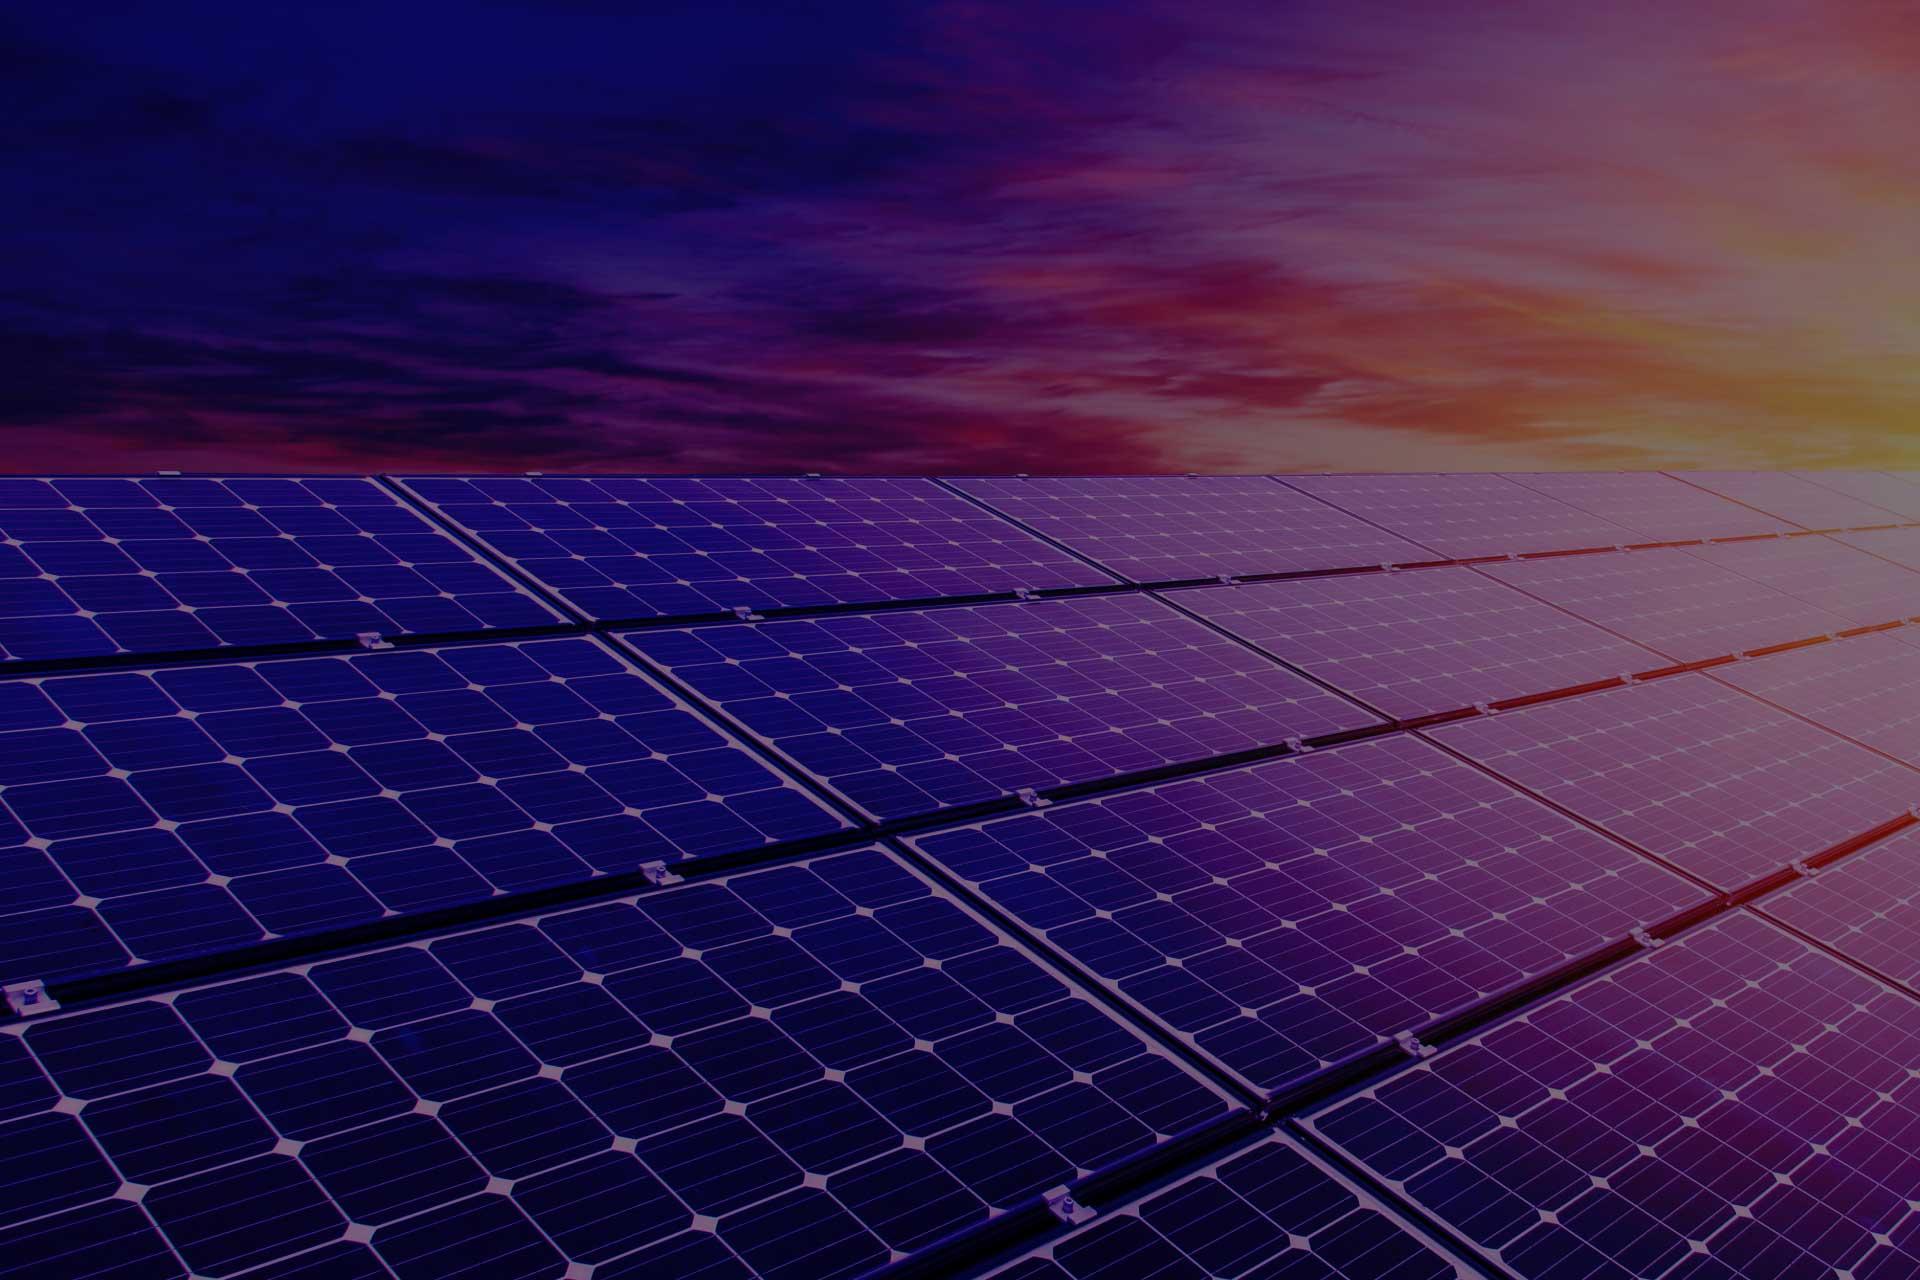 Proudly 100% Australia, The Green Guys Group provide money saving solar energy solutions.